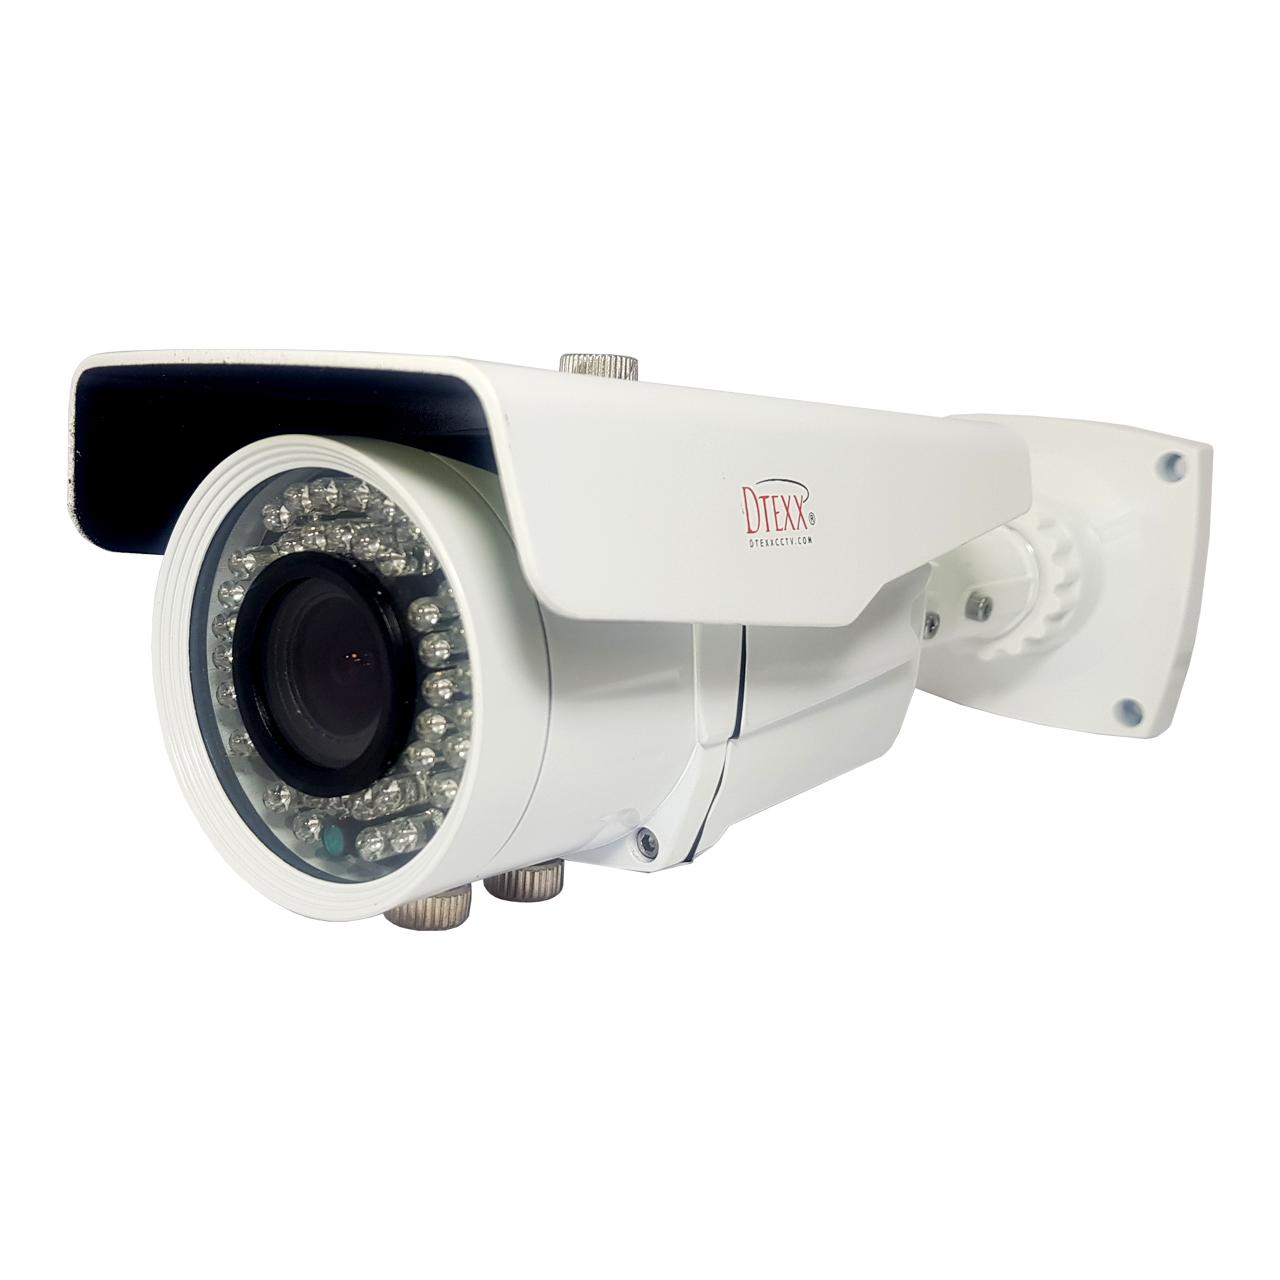 دوربین مداربسته تحت شبکه دیتکس مدل 331VEL